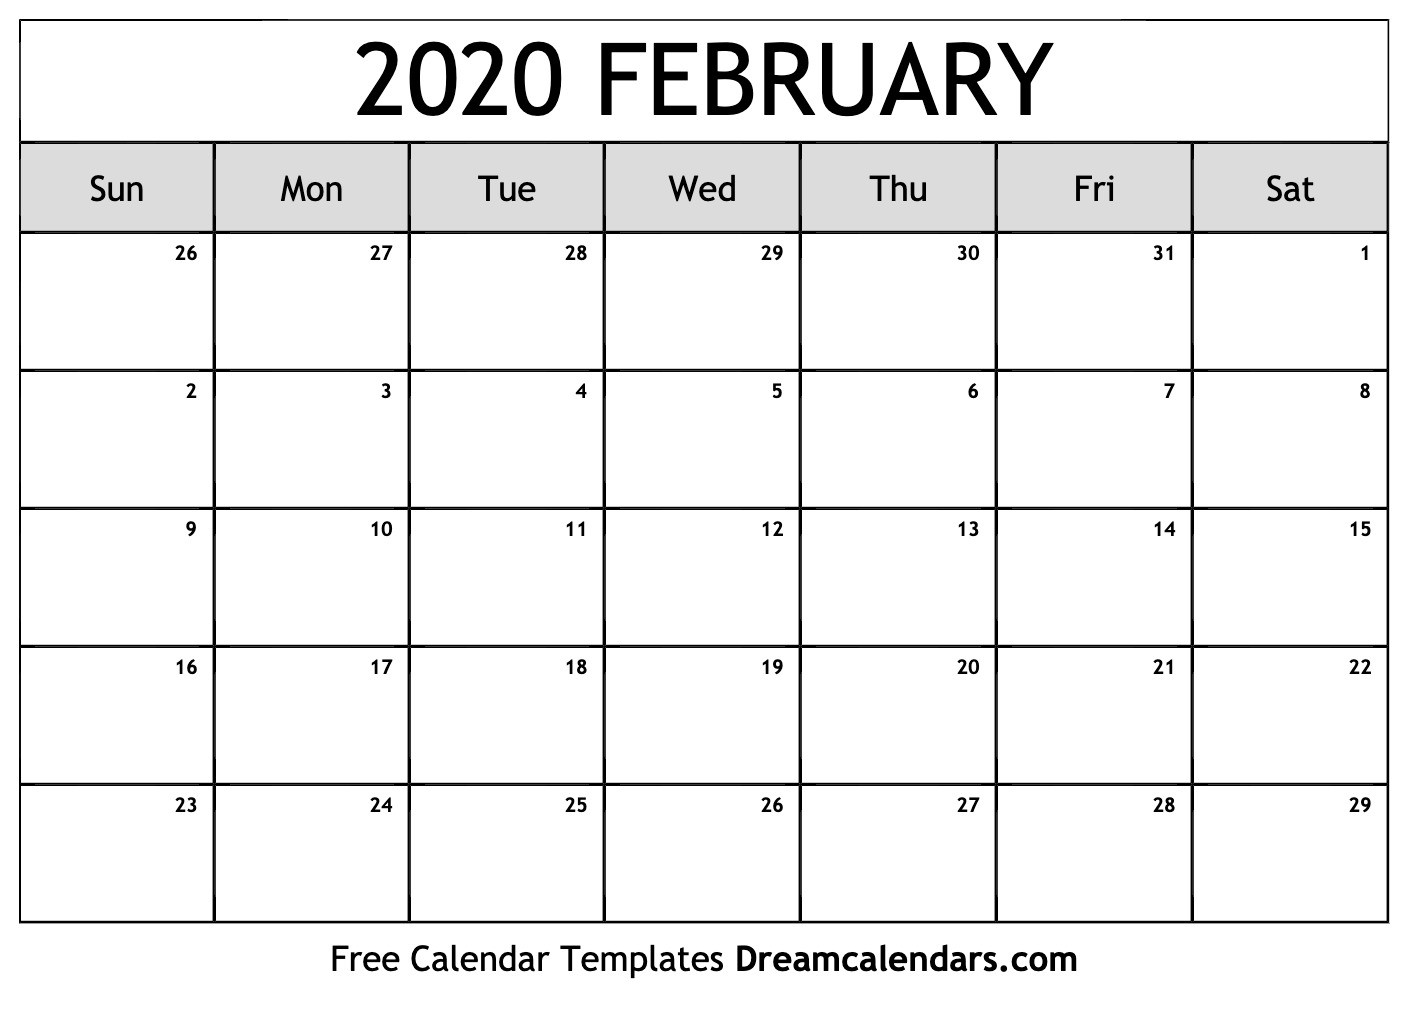 Feb 2020 Calendar Printable Free Blank February 2020 Printable Calendar